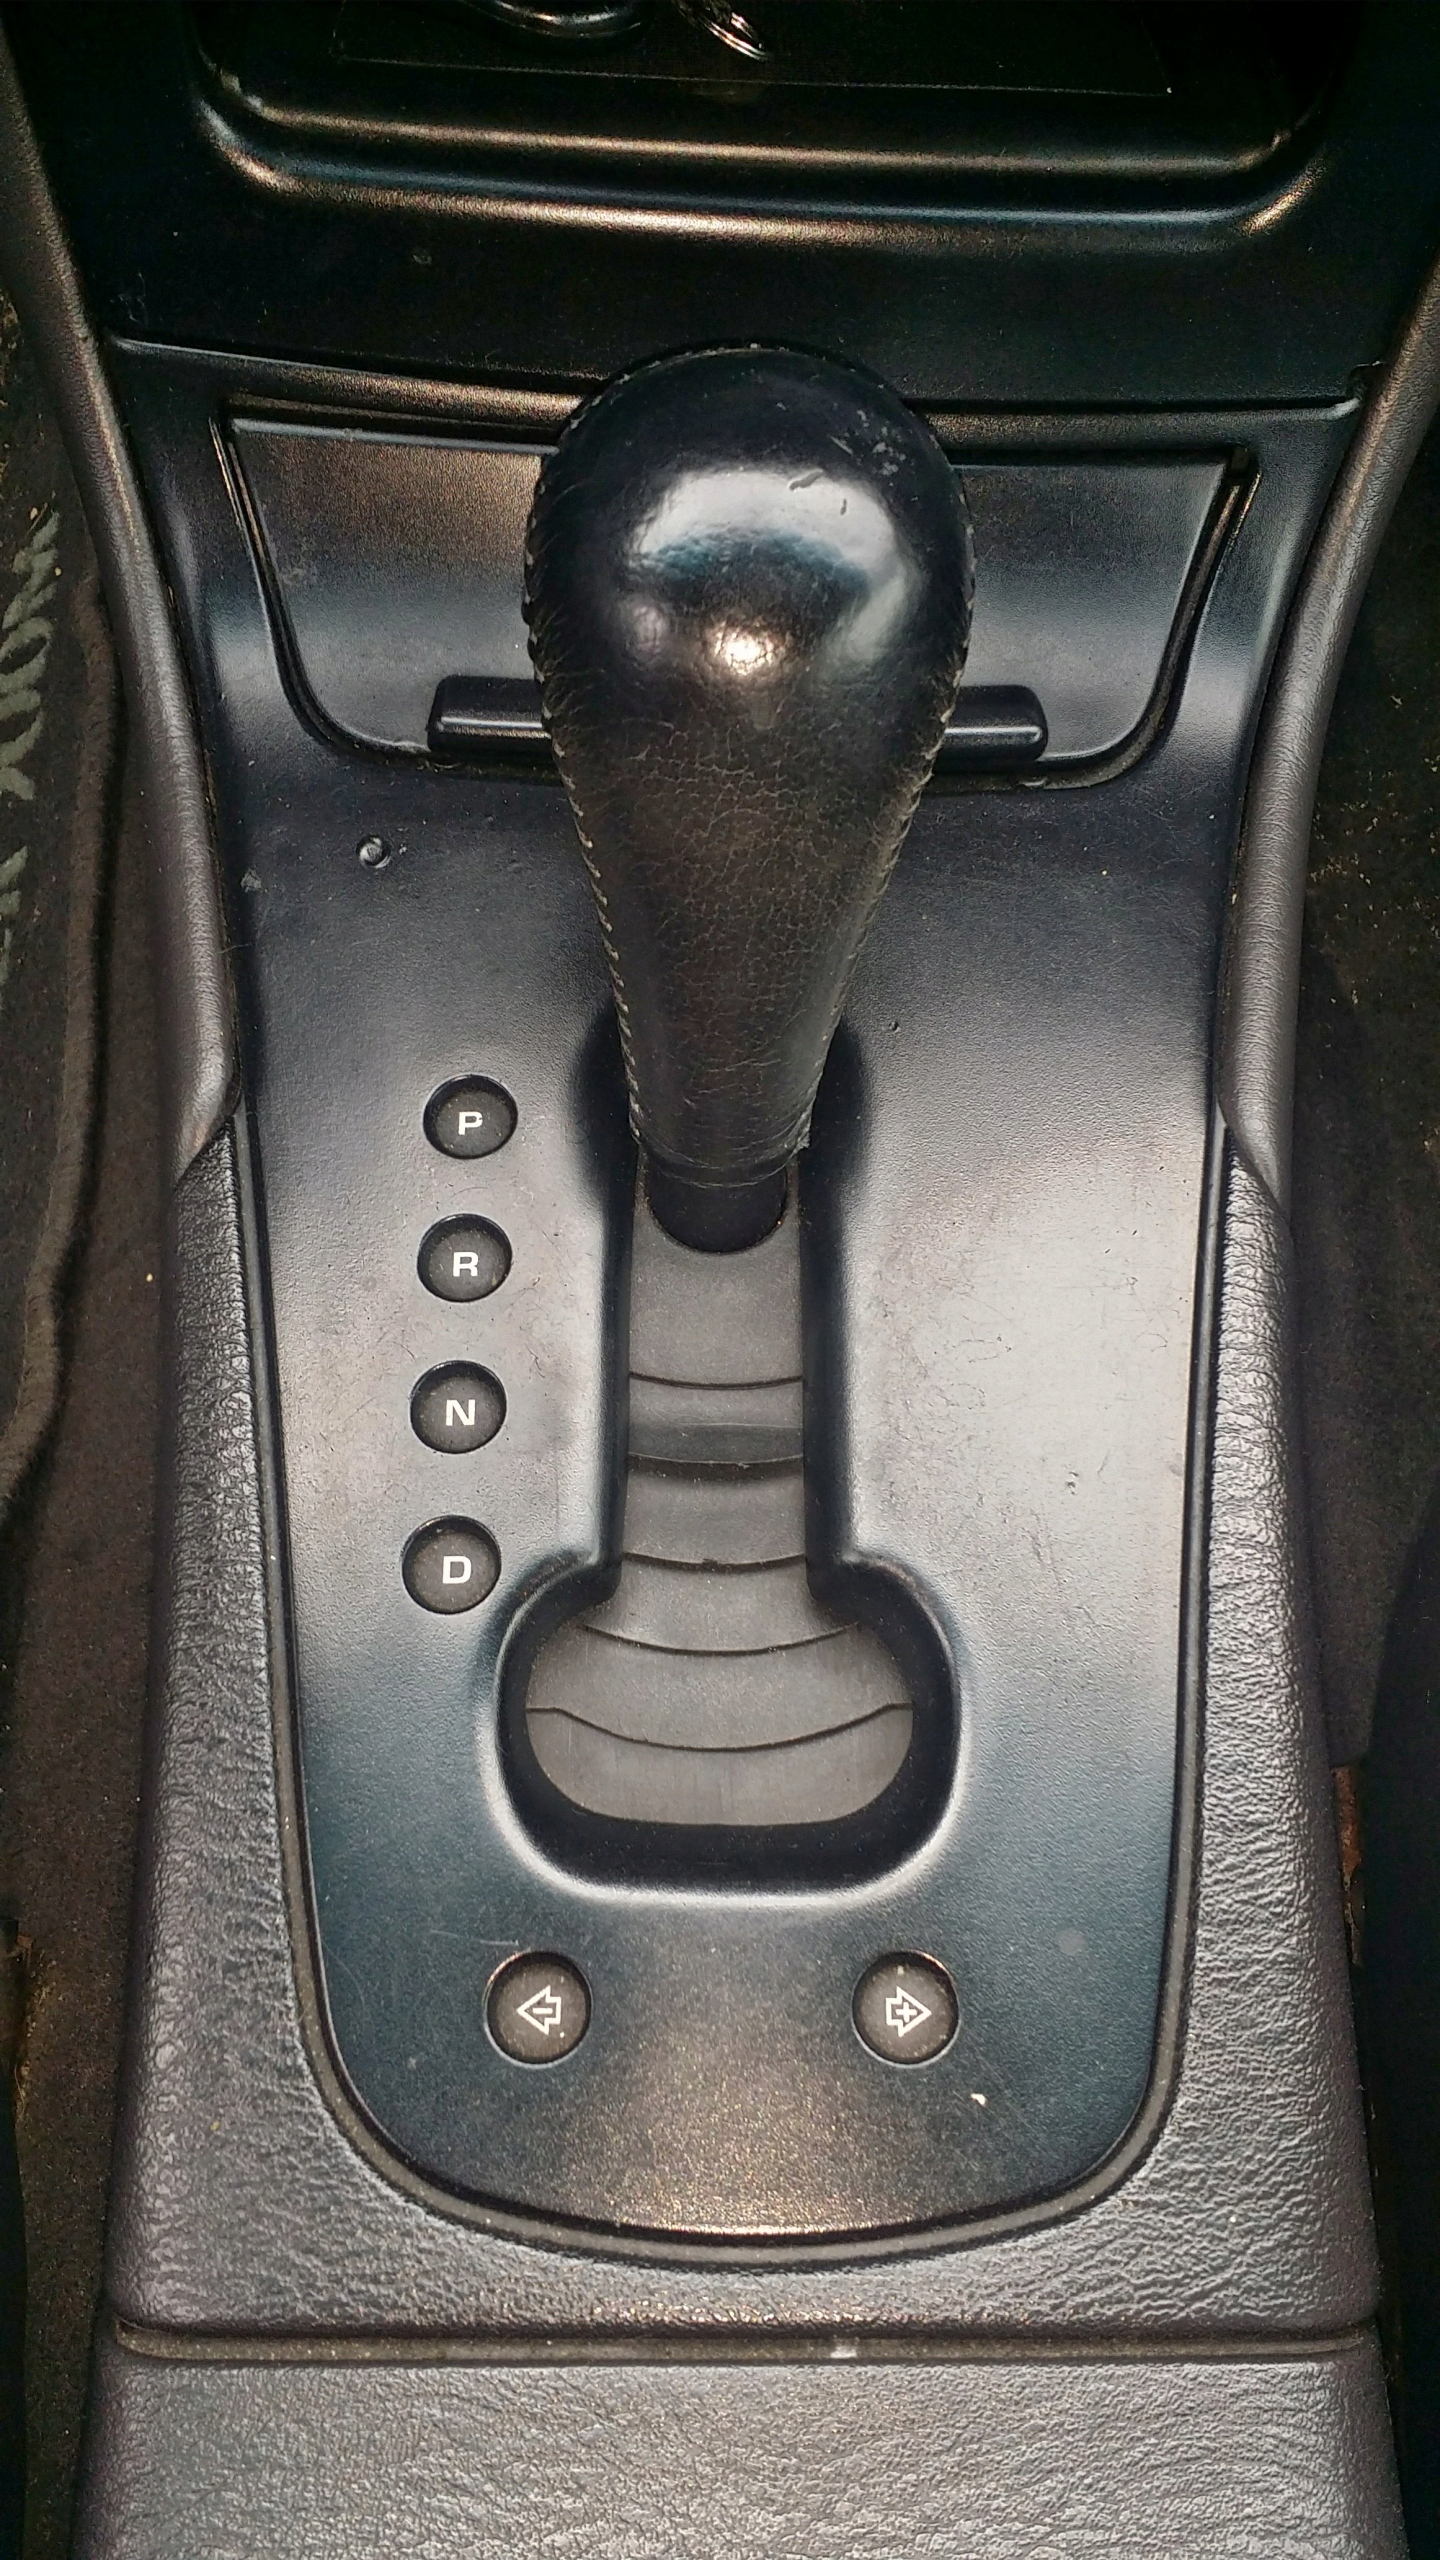 chrysler 300m 35 v6 коробка передач автомат